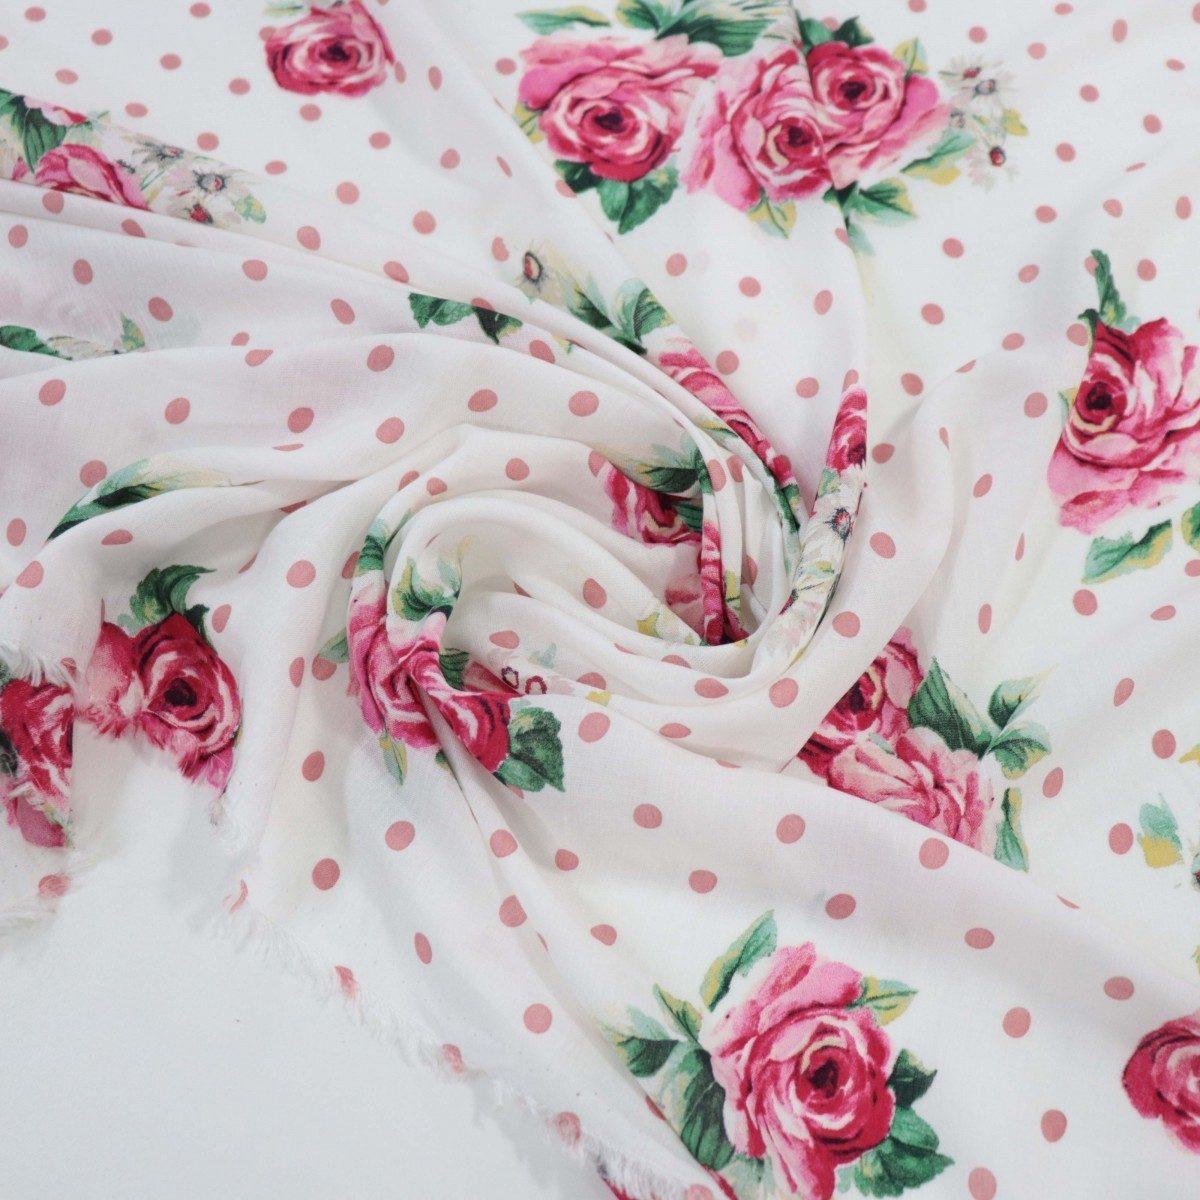 Tecido Crepe de Viscose Italiano Floral e Poá Tons de Rosa